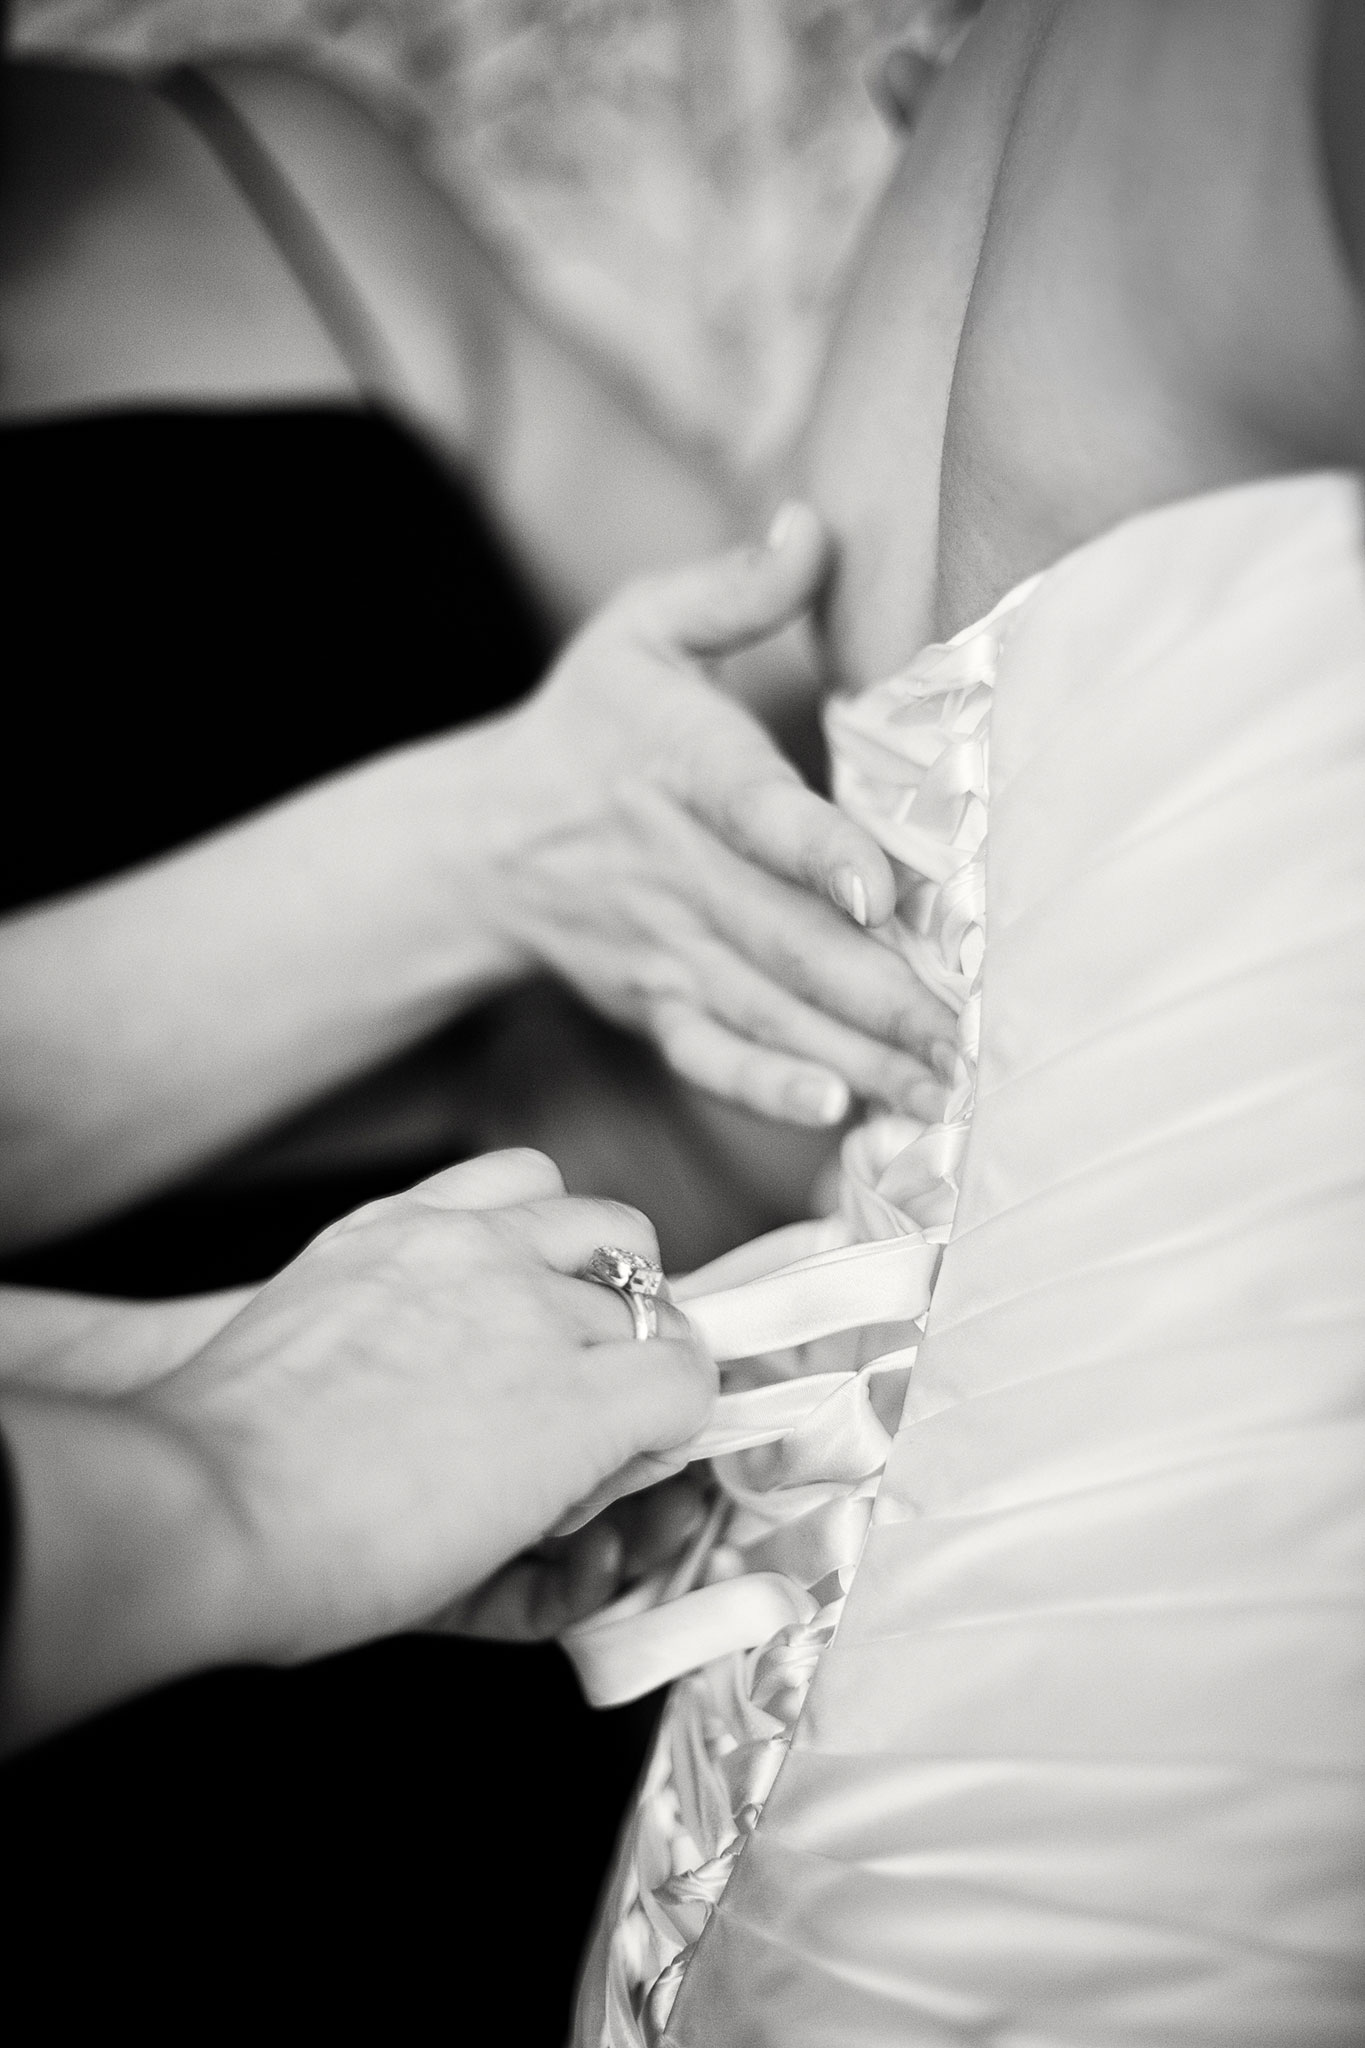 wedding-photographer-toronto-canada-shayne-gray_3942.jpg